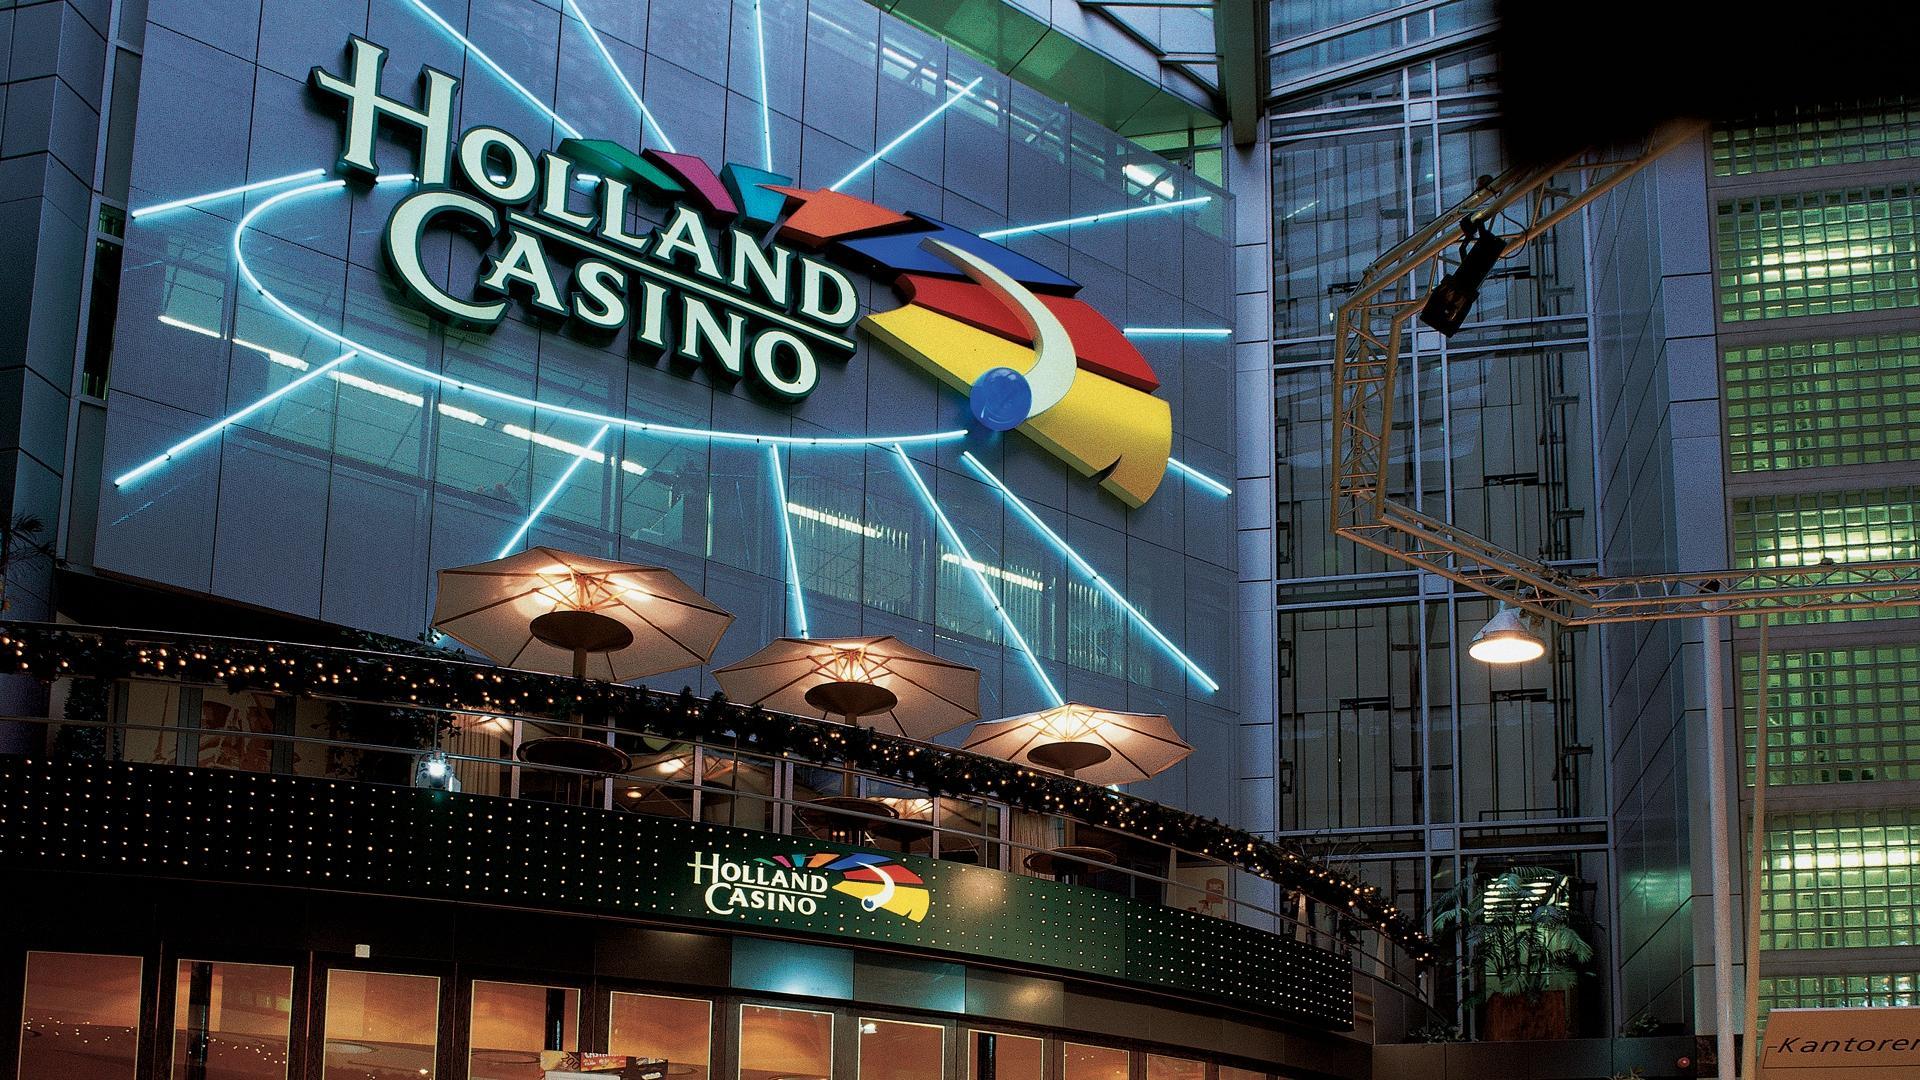 Casino rotterdam hollande espace balneo casino barriere ribeauville